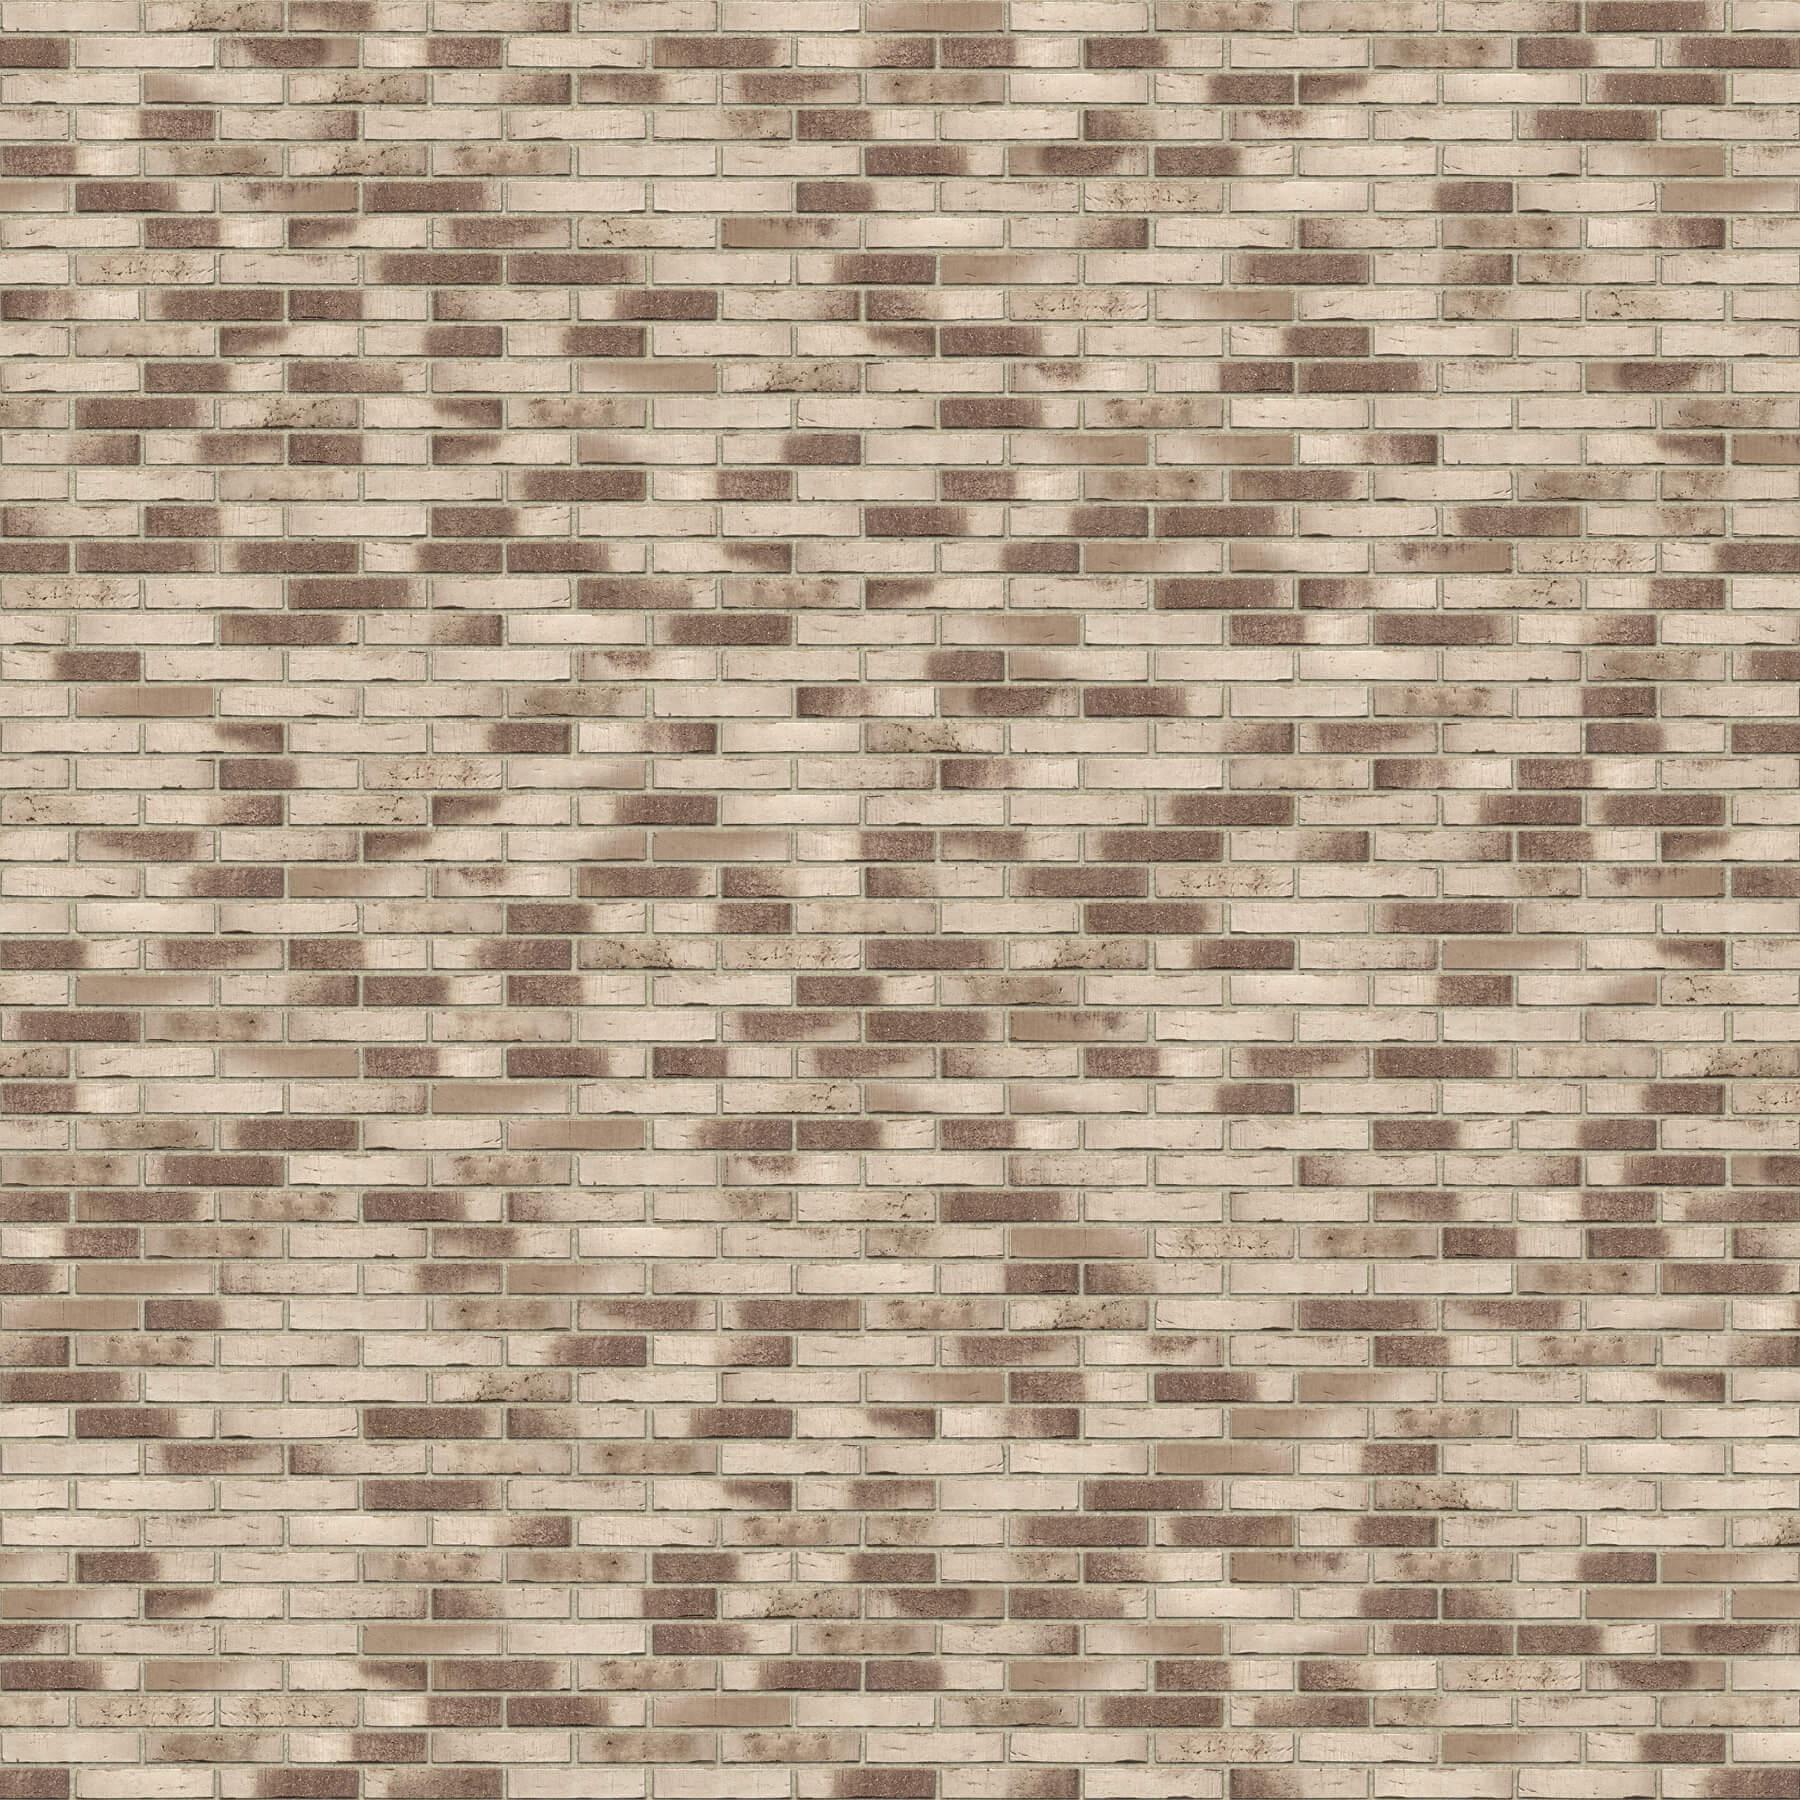 Puna-cigla-FeldHaus-Klinker-brick-house-beograd-df-k-948-Bez Fuga